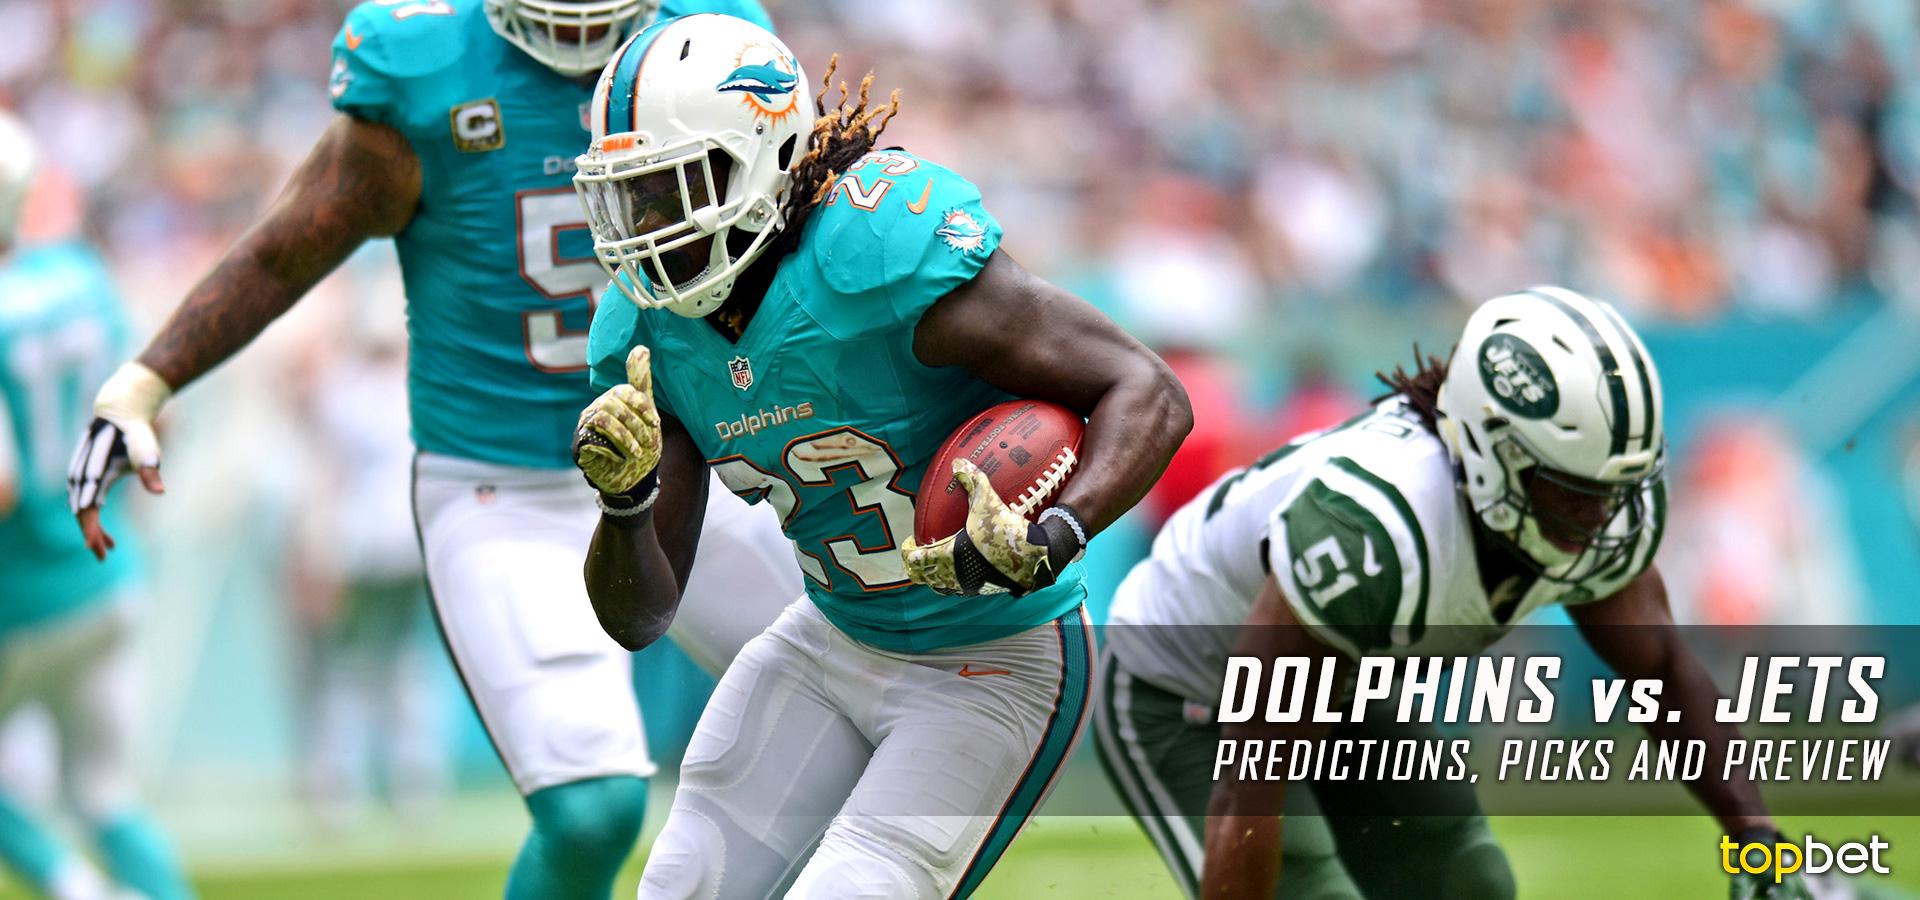 Miami Dolphins vs New York Jets Predictions, Picks & Preview